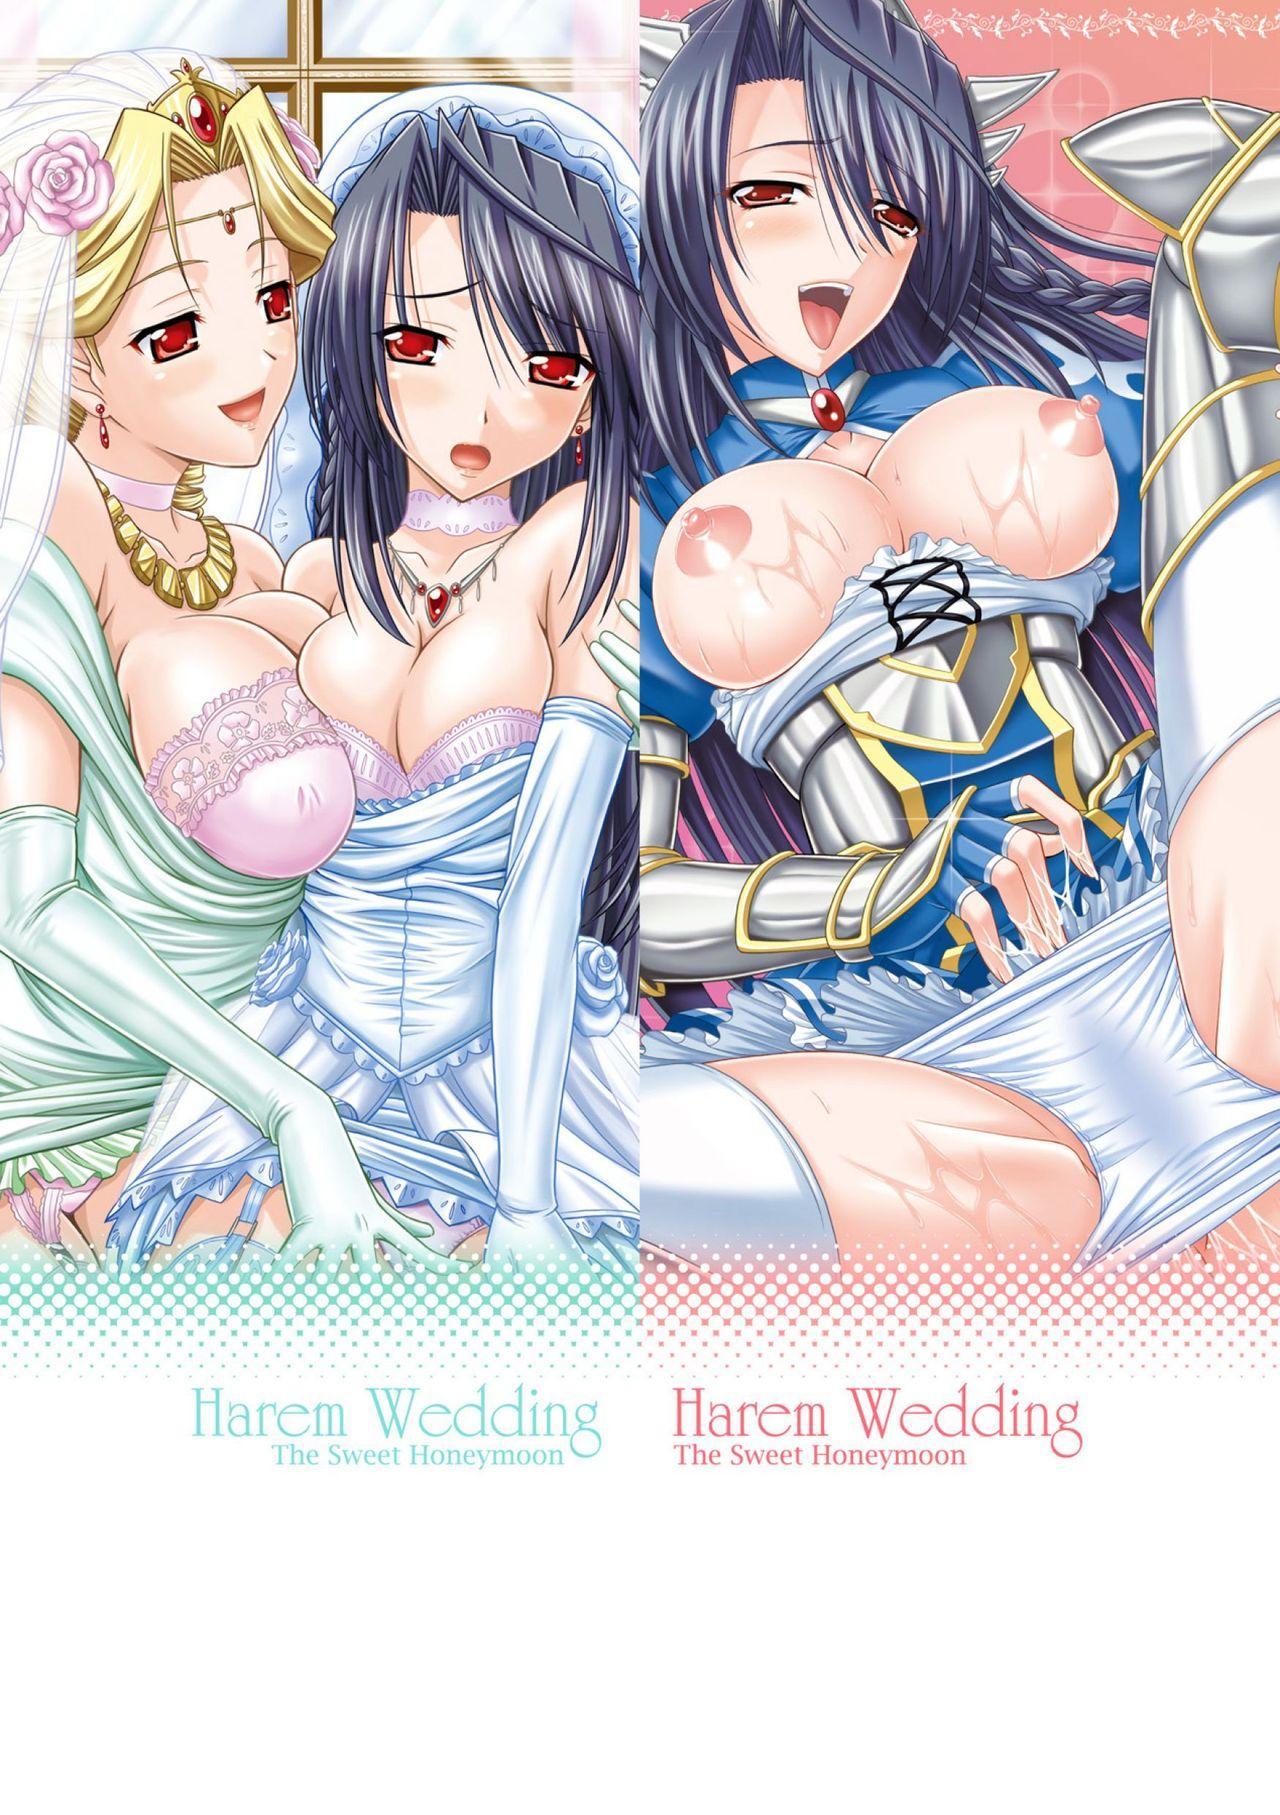 Harem Wedding The Sweet Honeymoon 200